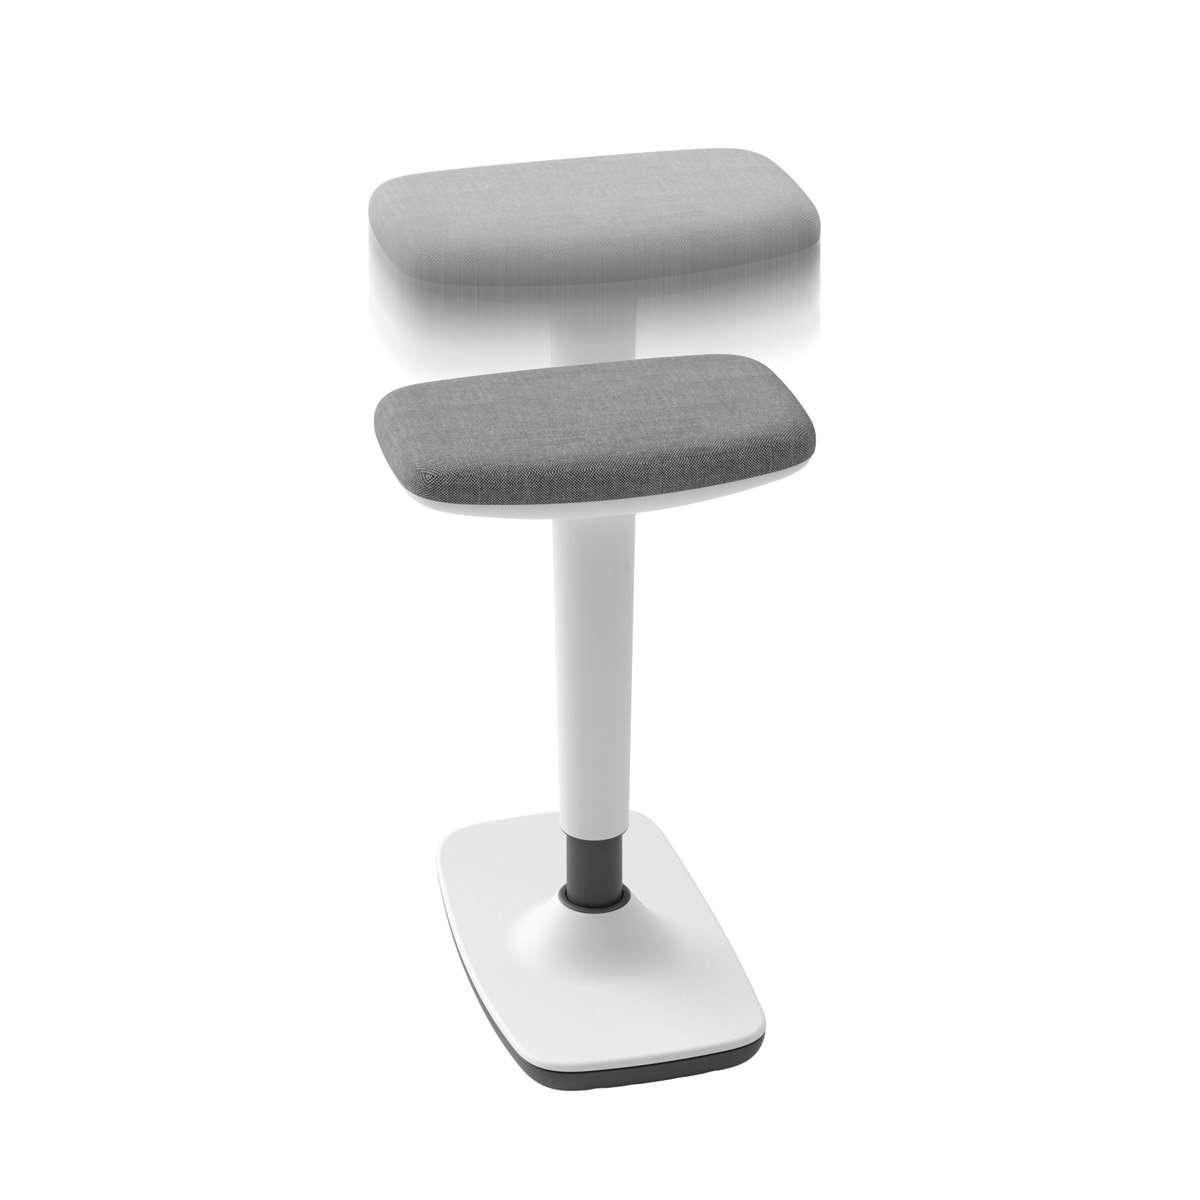 Taburete Tritt regulable en altura color blanco. Tapizado gris